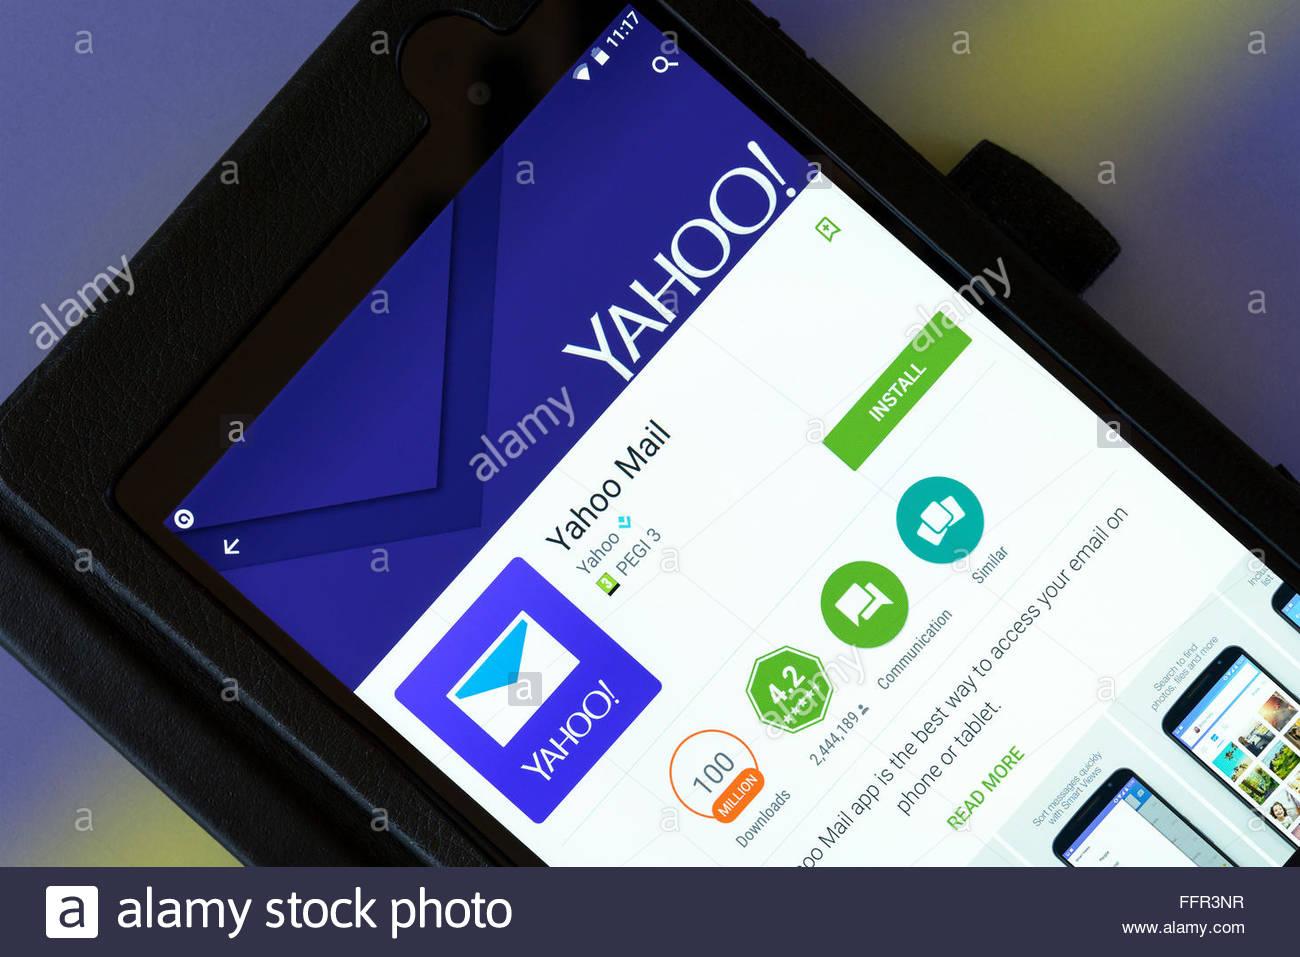 yahoo mail uk mobile